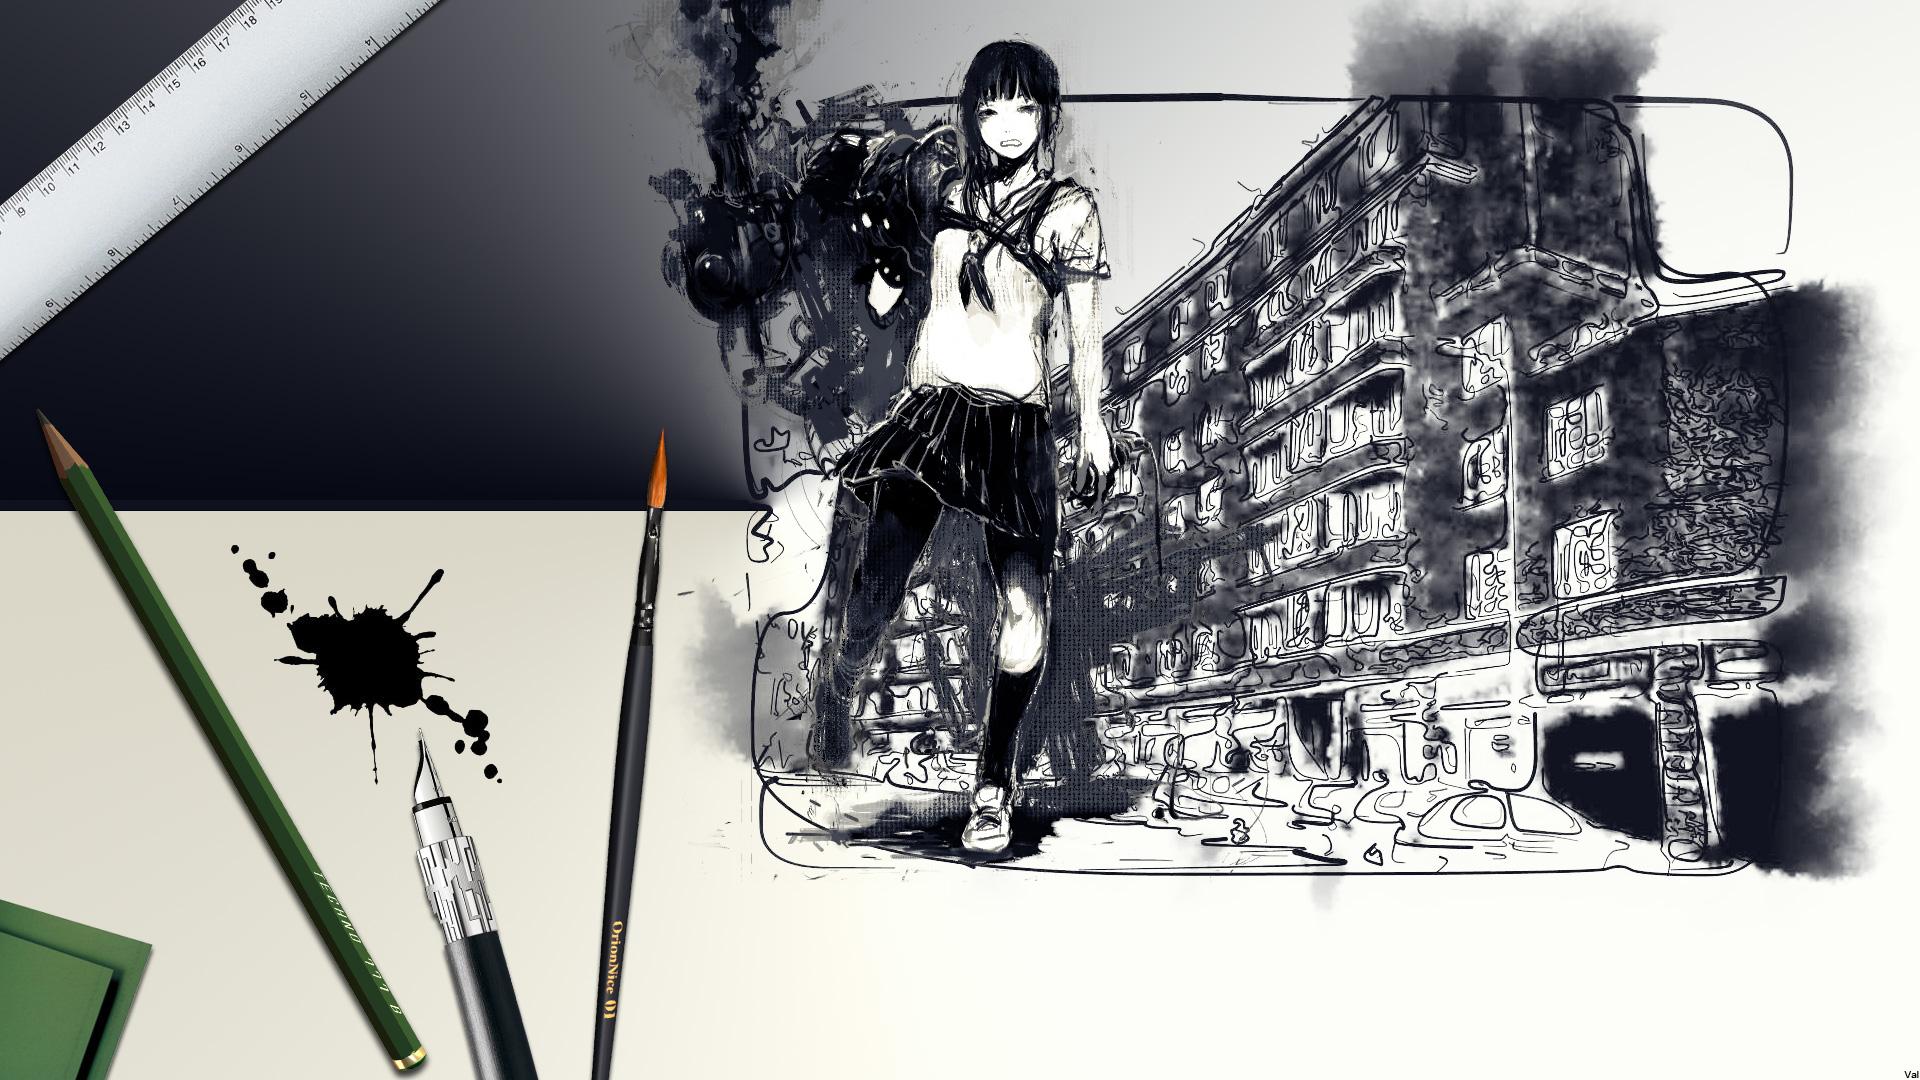 Fonds d'écran Art - Peinture Anges & Démons Street Art